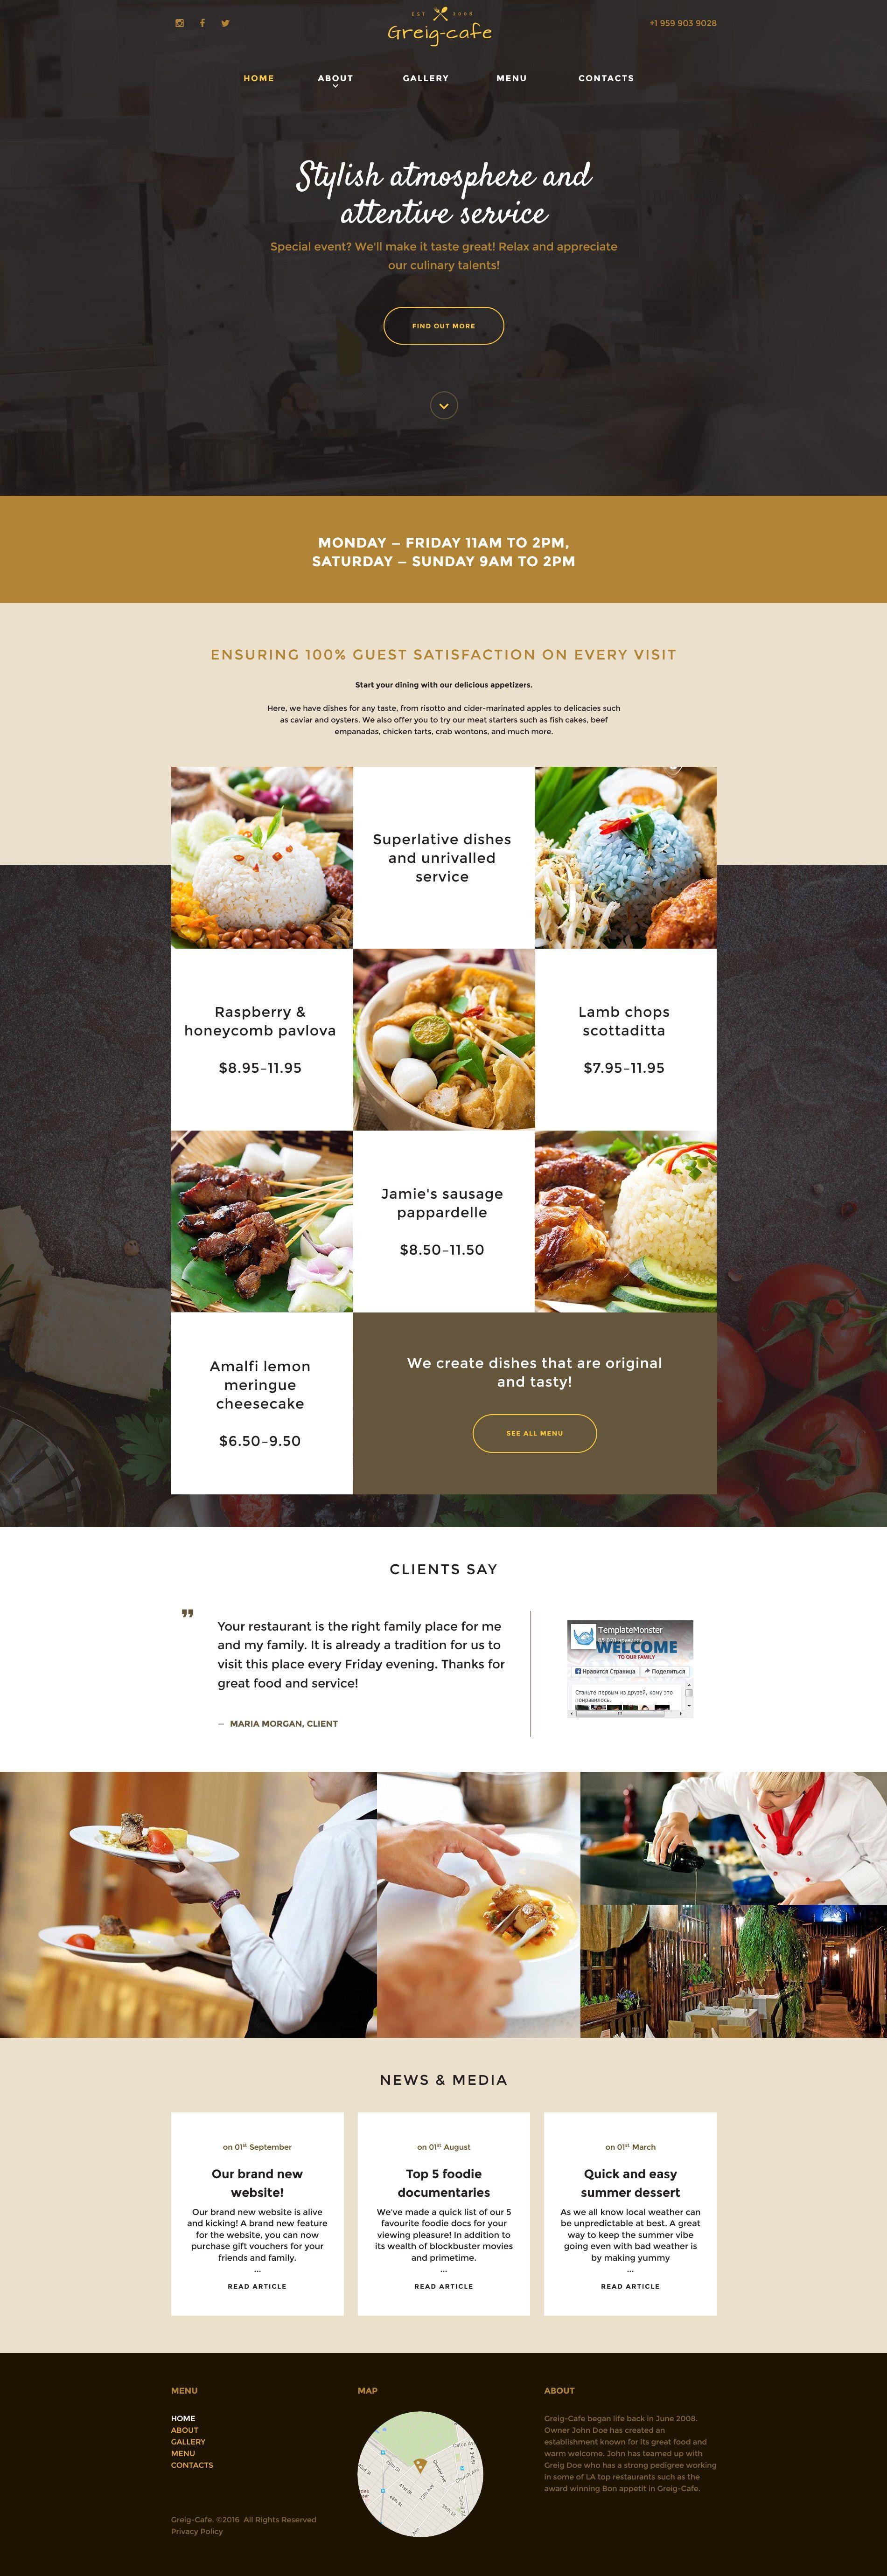 greig cafe website template pinterest template website and